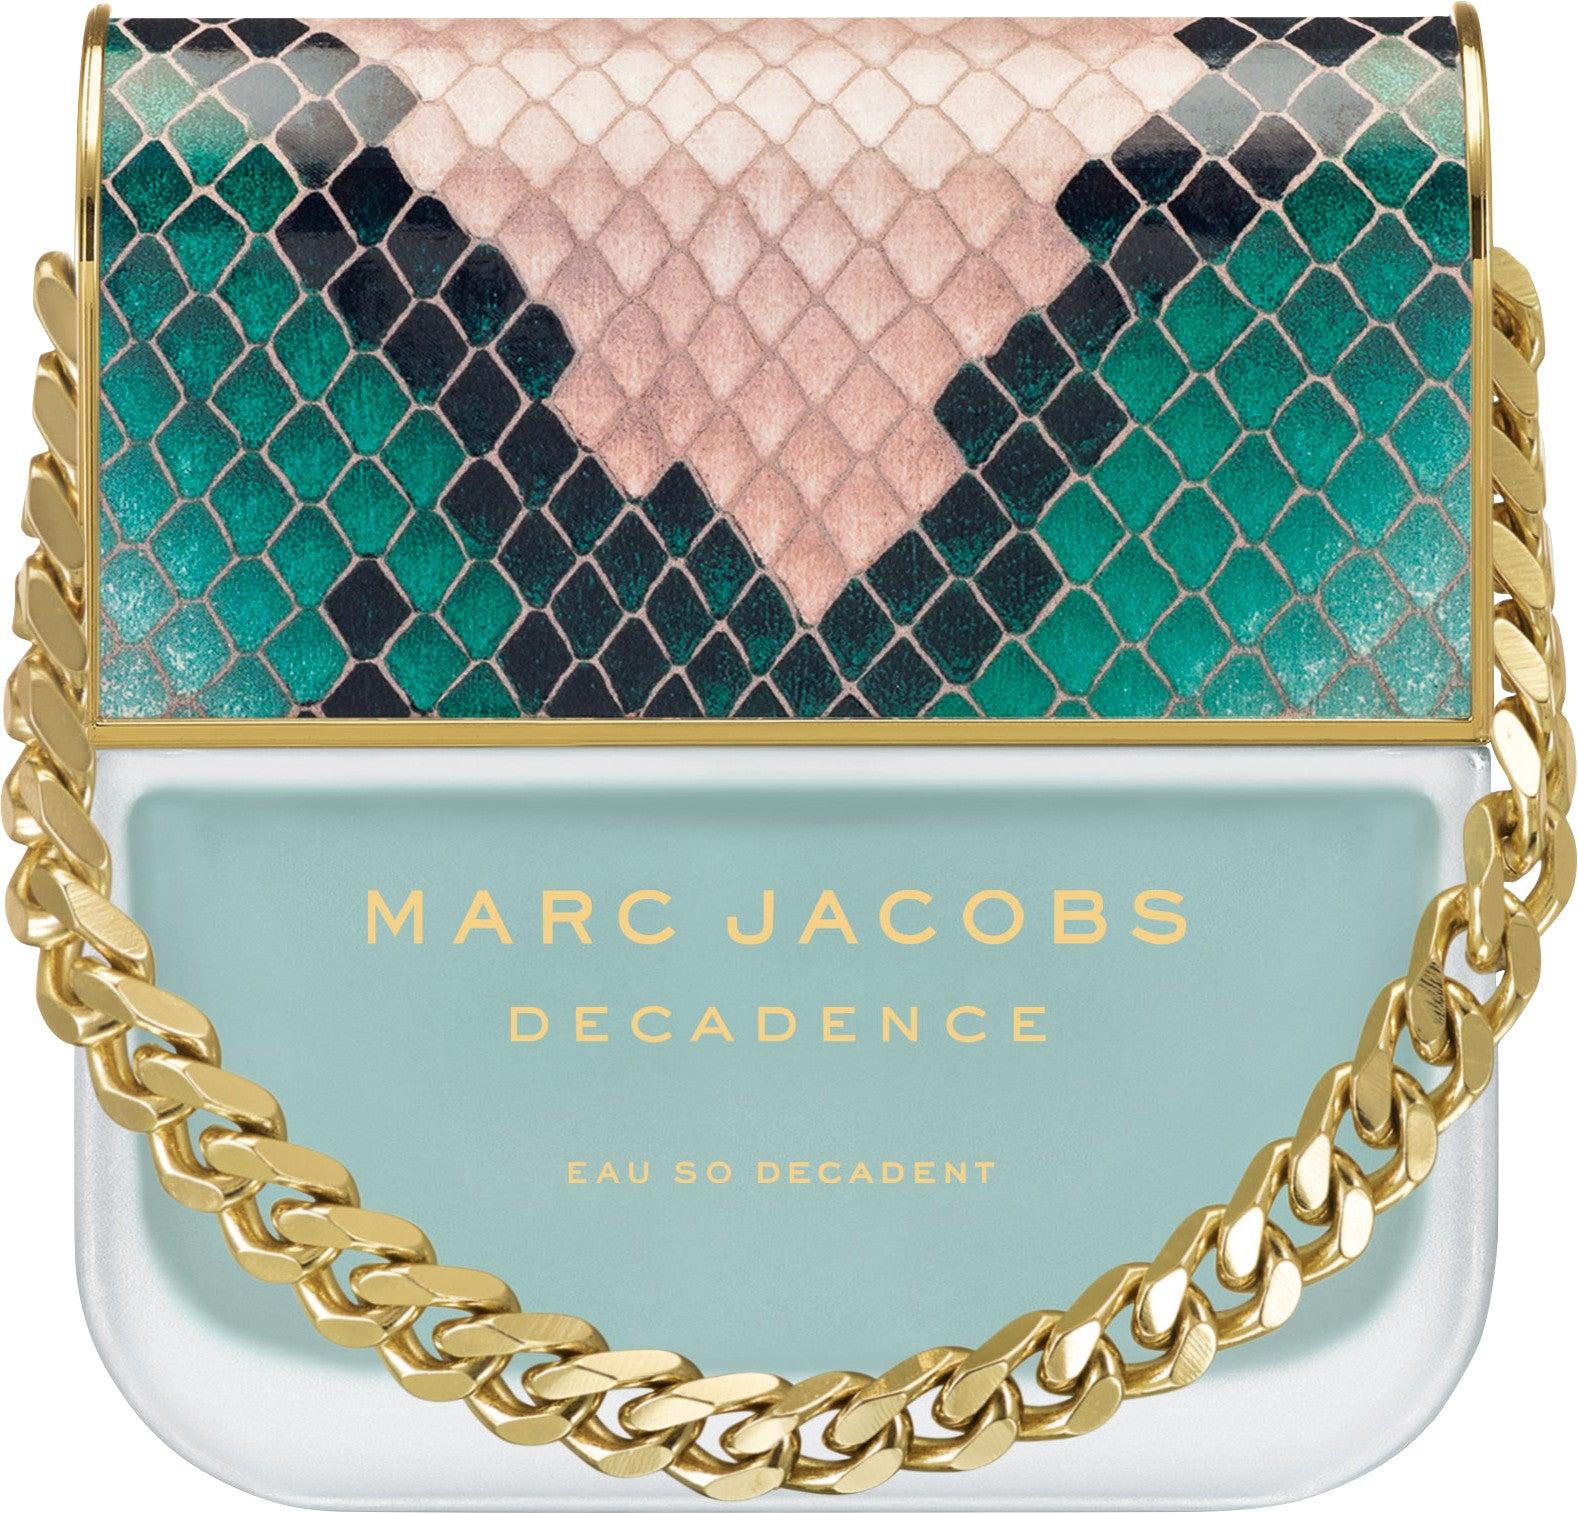 Marc Jacobs Decadence Eau So Decadent 50ml EDT Women's Perfume